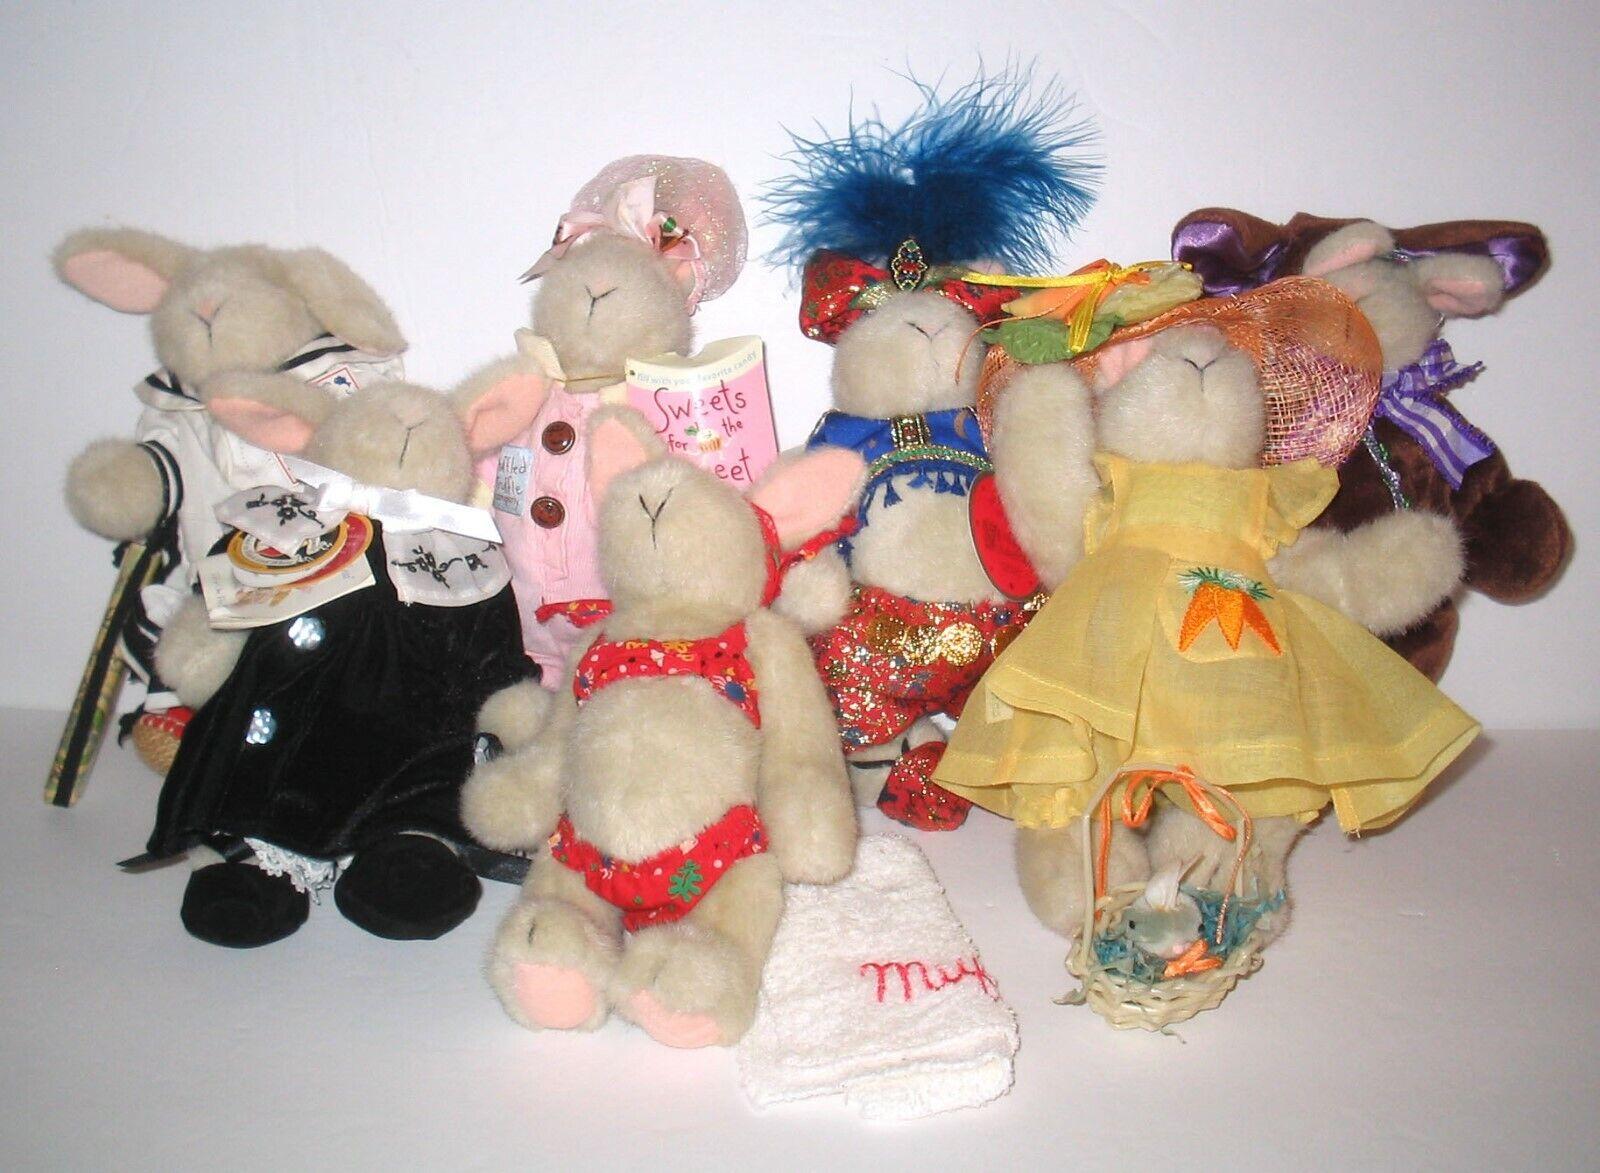 Bundled Lot 7 Dressed HOPPY VANDERHARE Plush Muffy   NAB